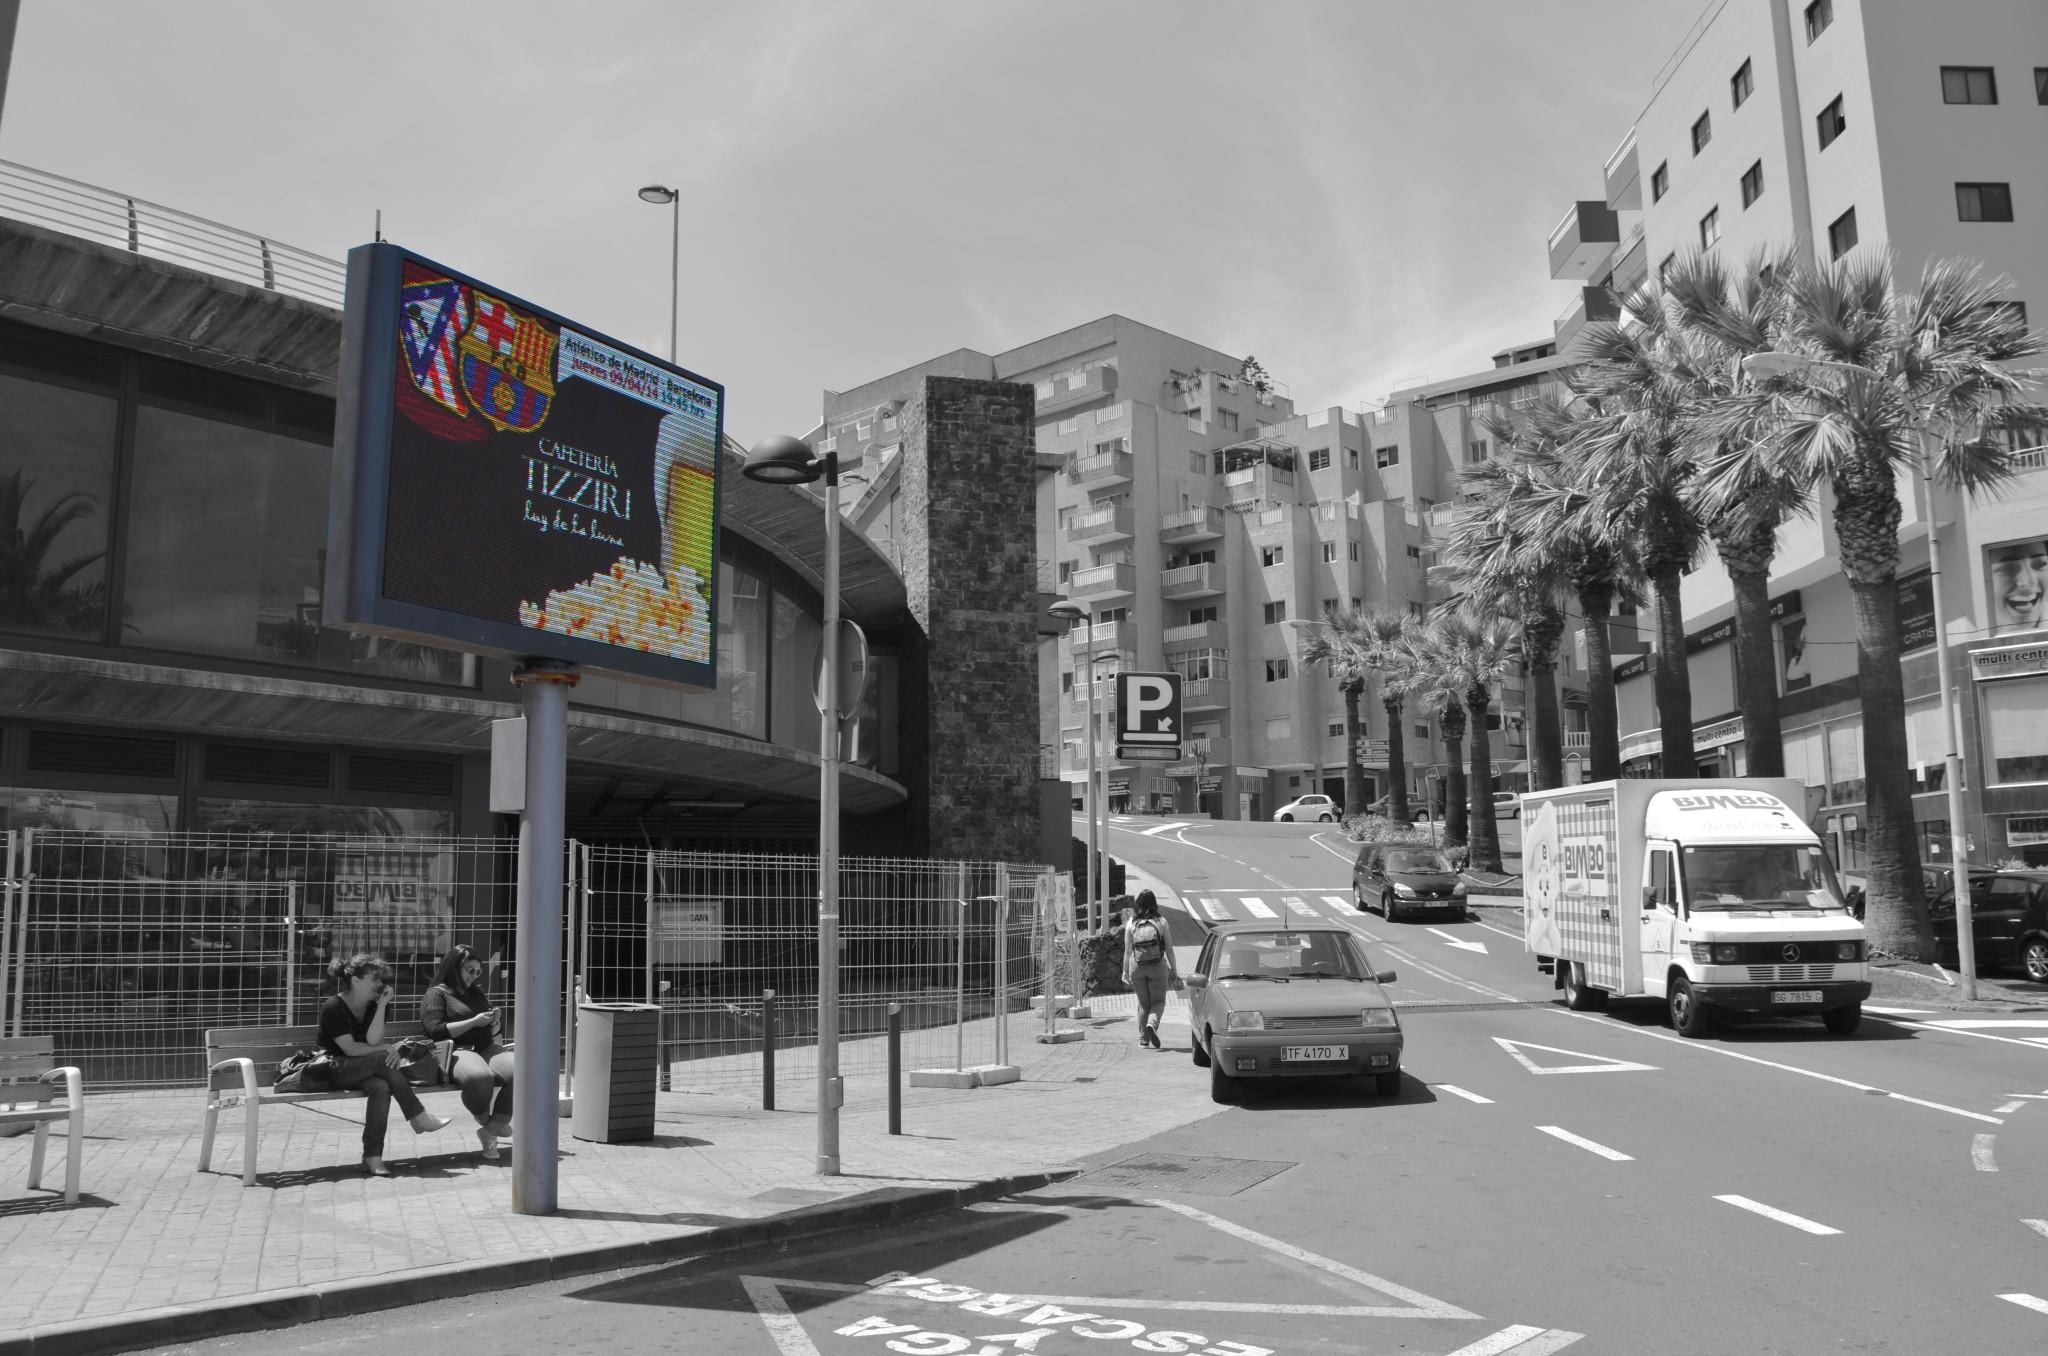 Pantall LED - El Puente (Redes)